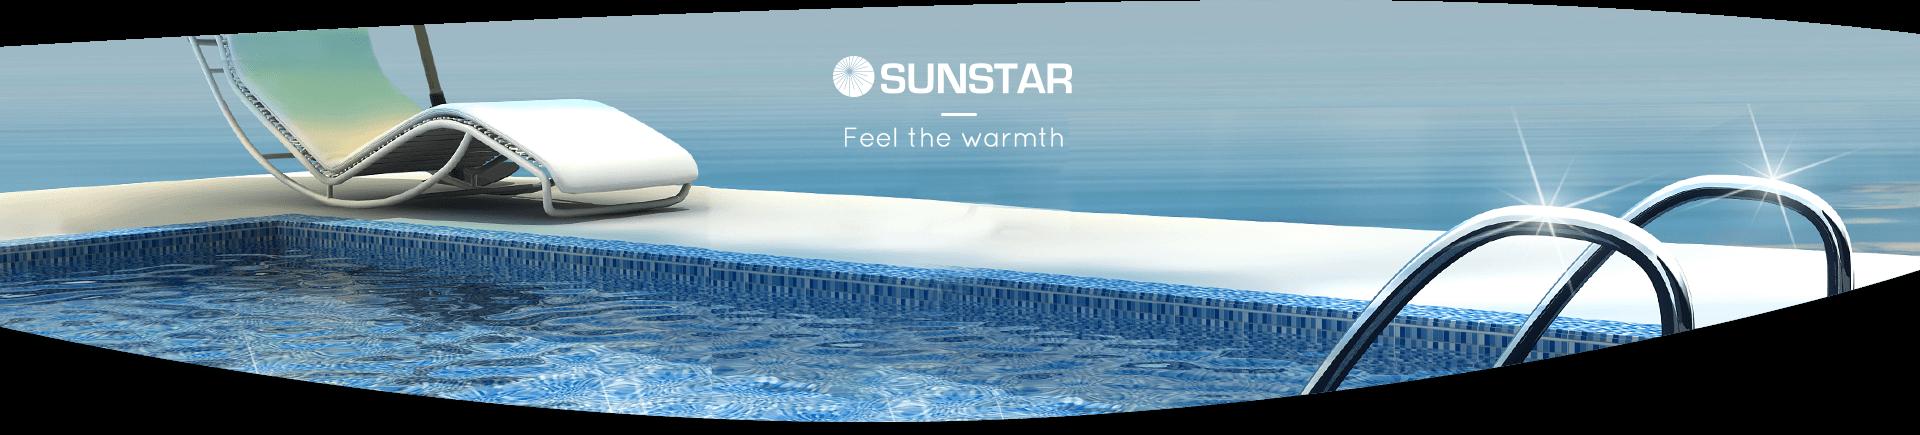 Sunstar Banner